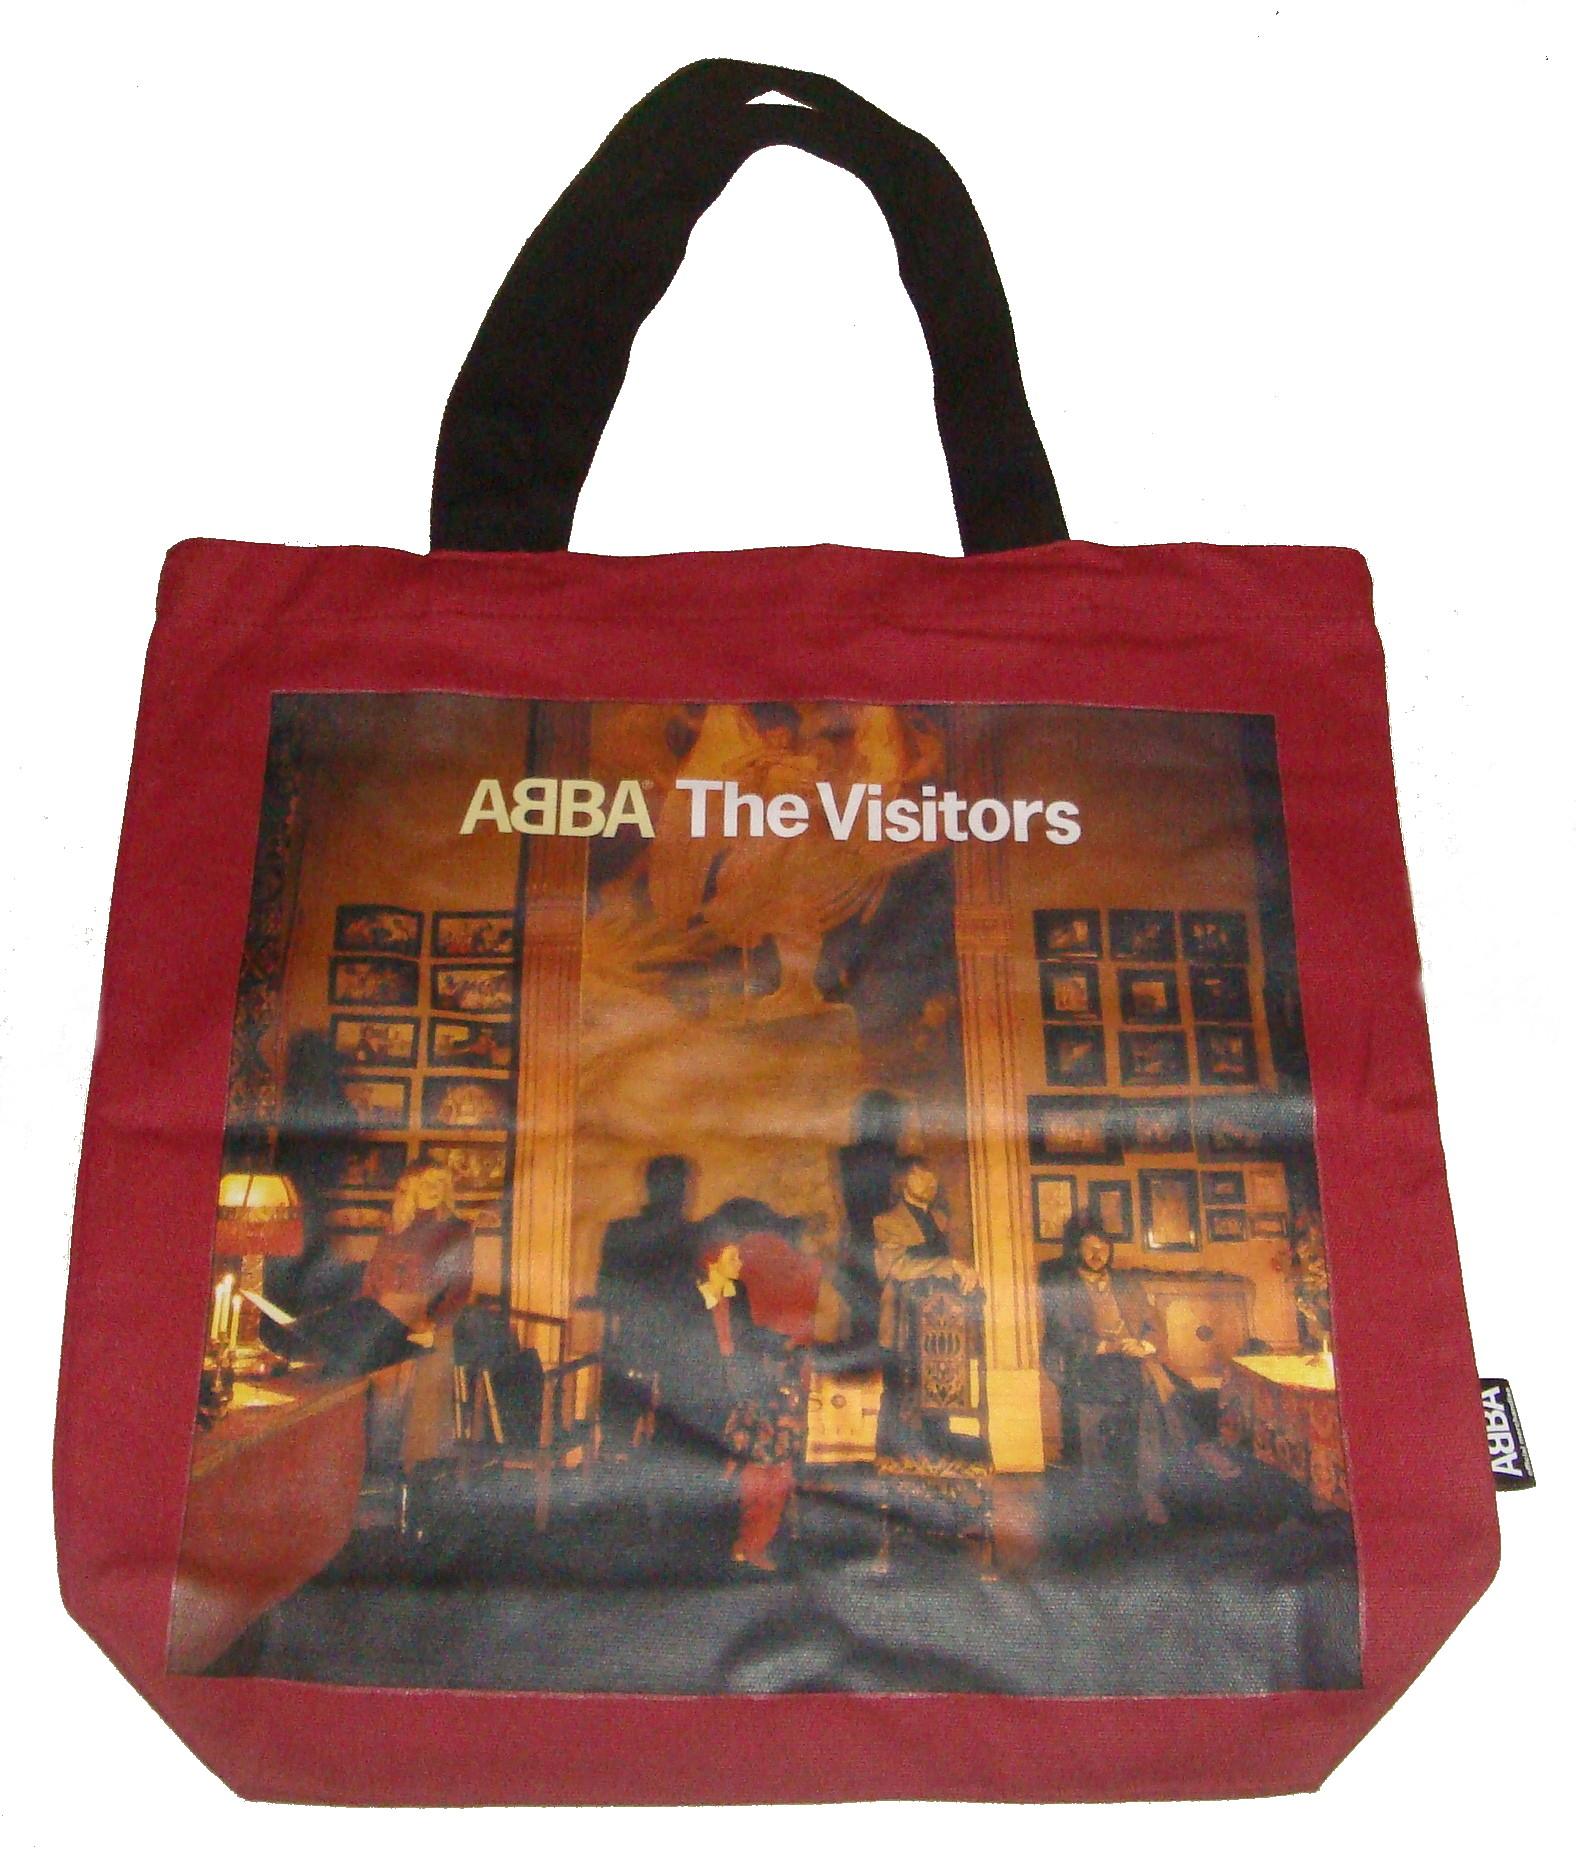 the visitors tote bag - polar 2.jpg